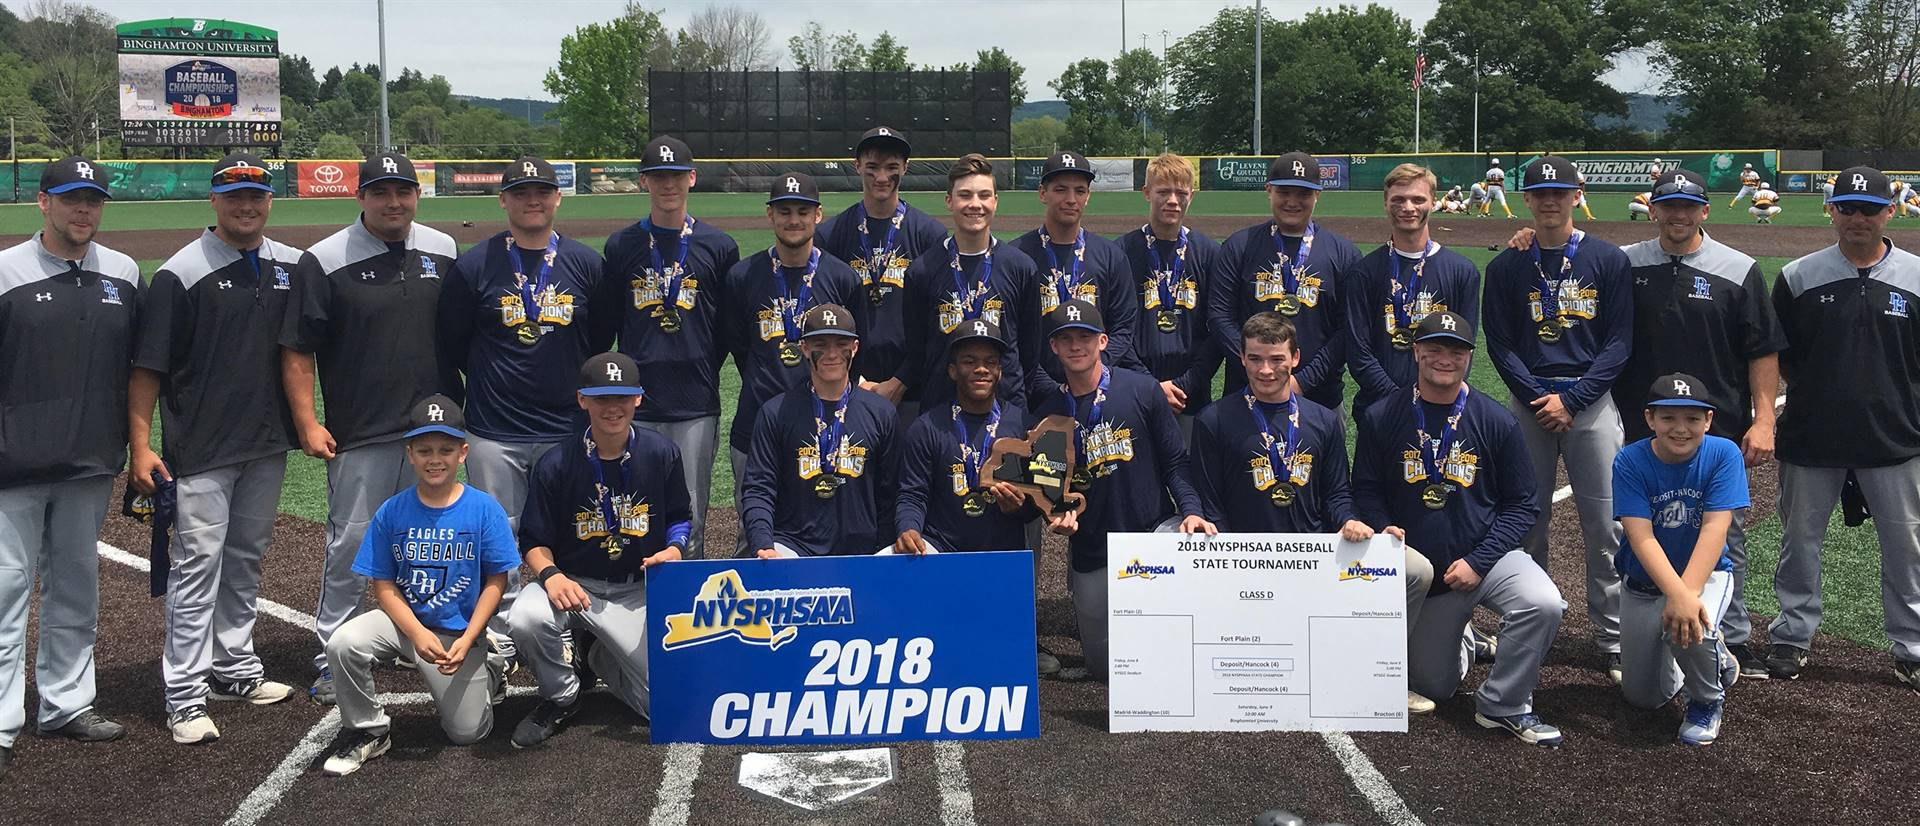 Deposit/Hancock state champion baseball team 2018